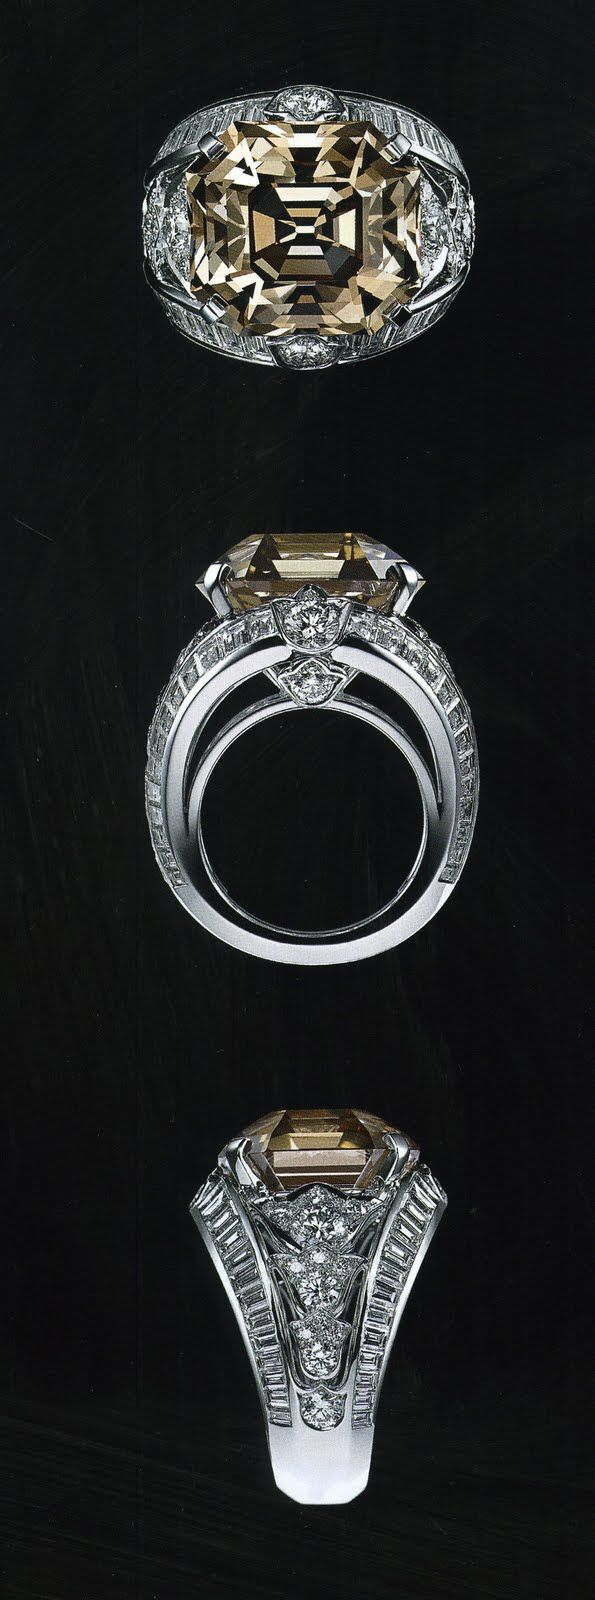 Men's Ring - Cartier Platinum Ring / emerald-cut 24 carat brown diamond and 31 diamonds